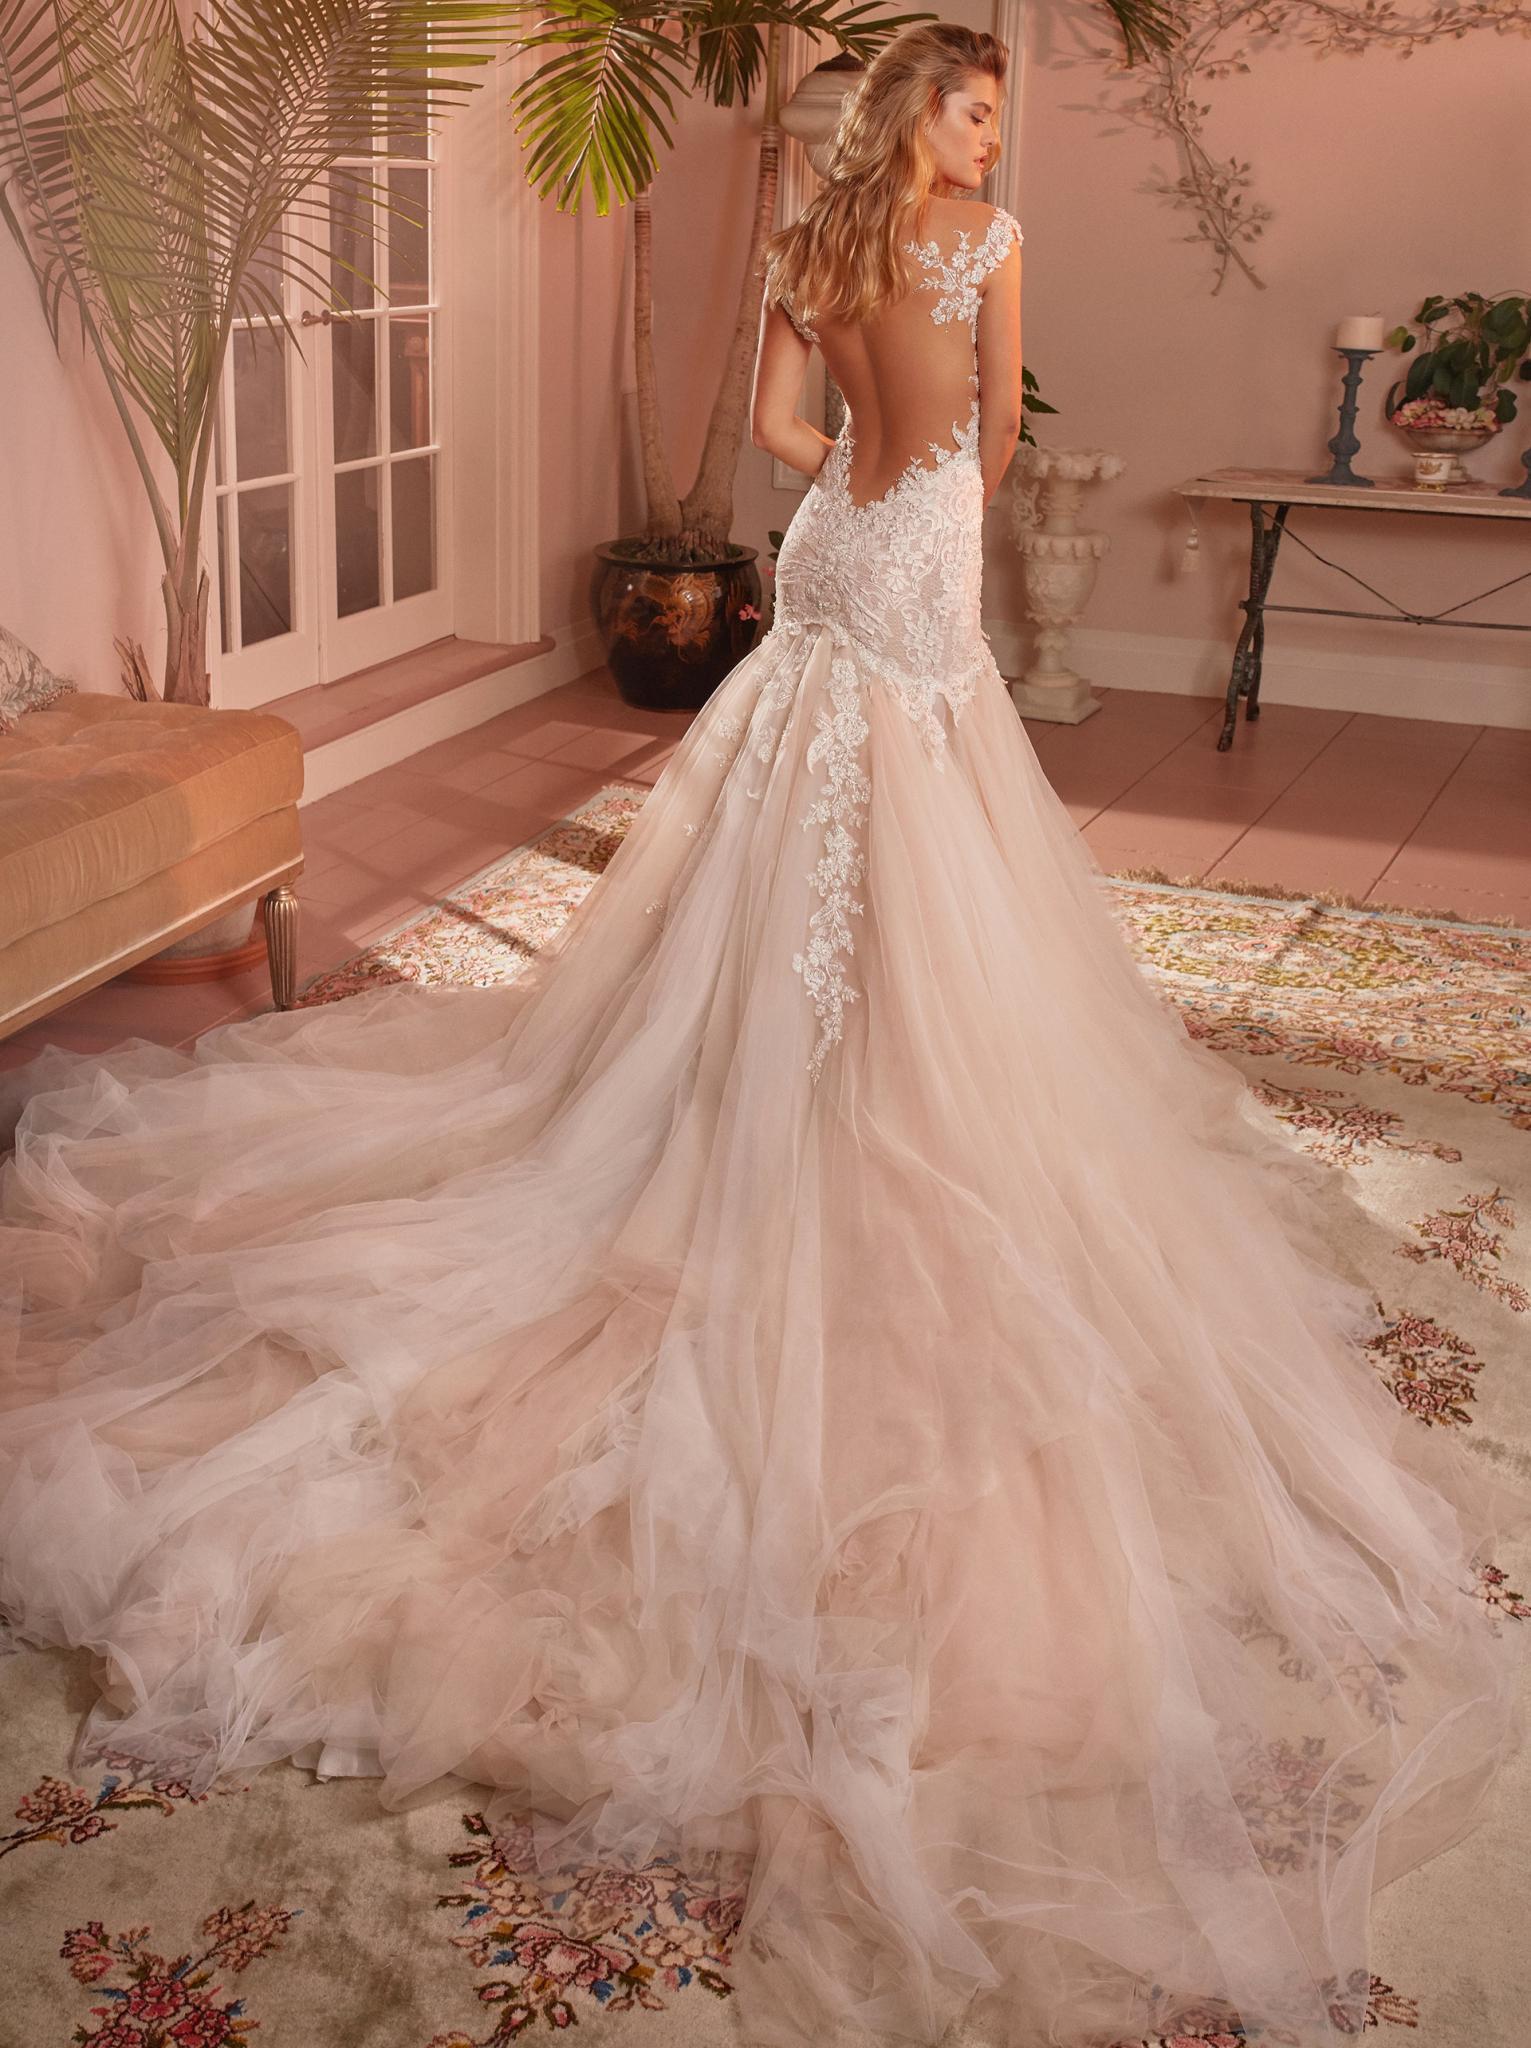 allegra queen of hearts bridal dresses galia lahav